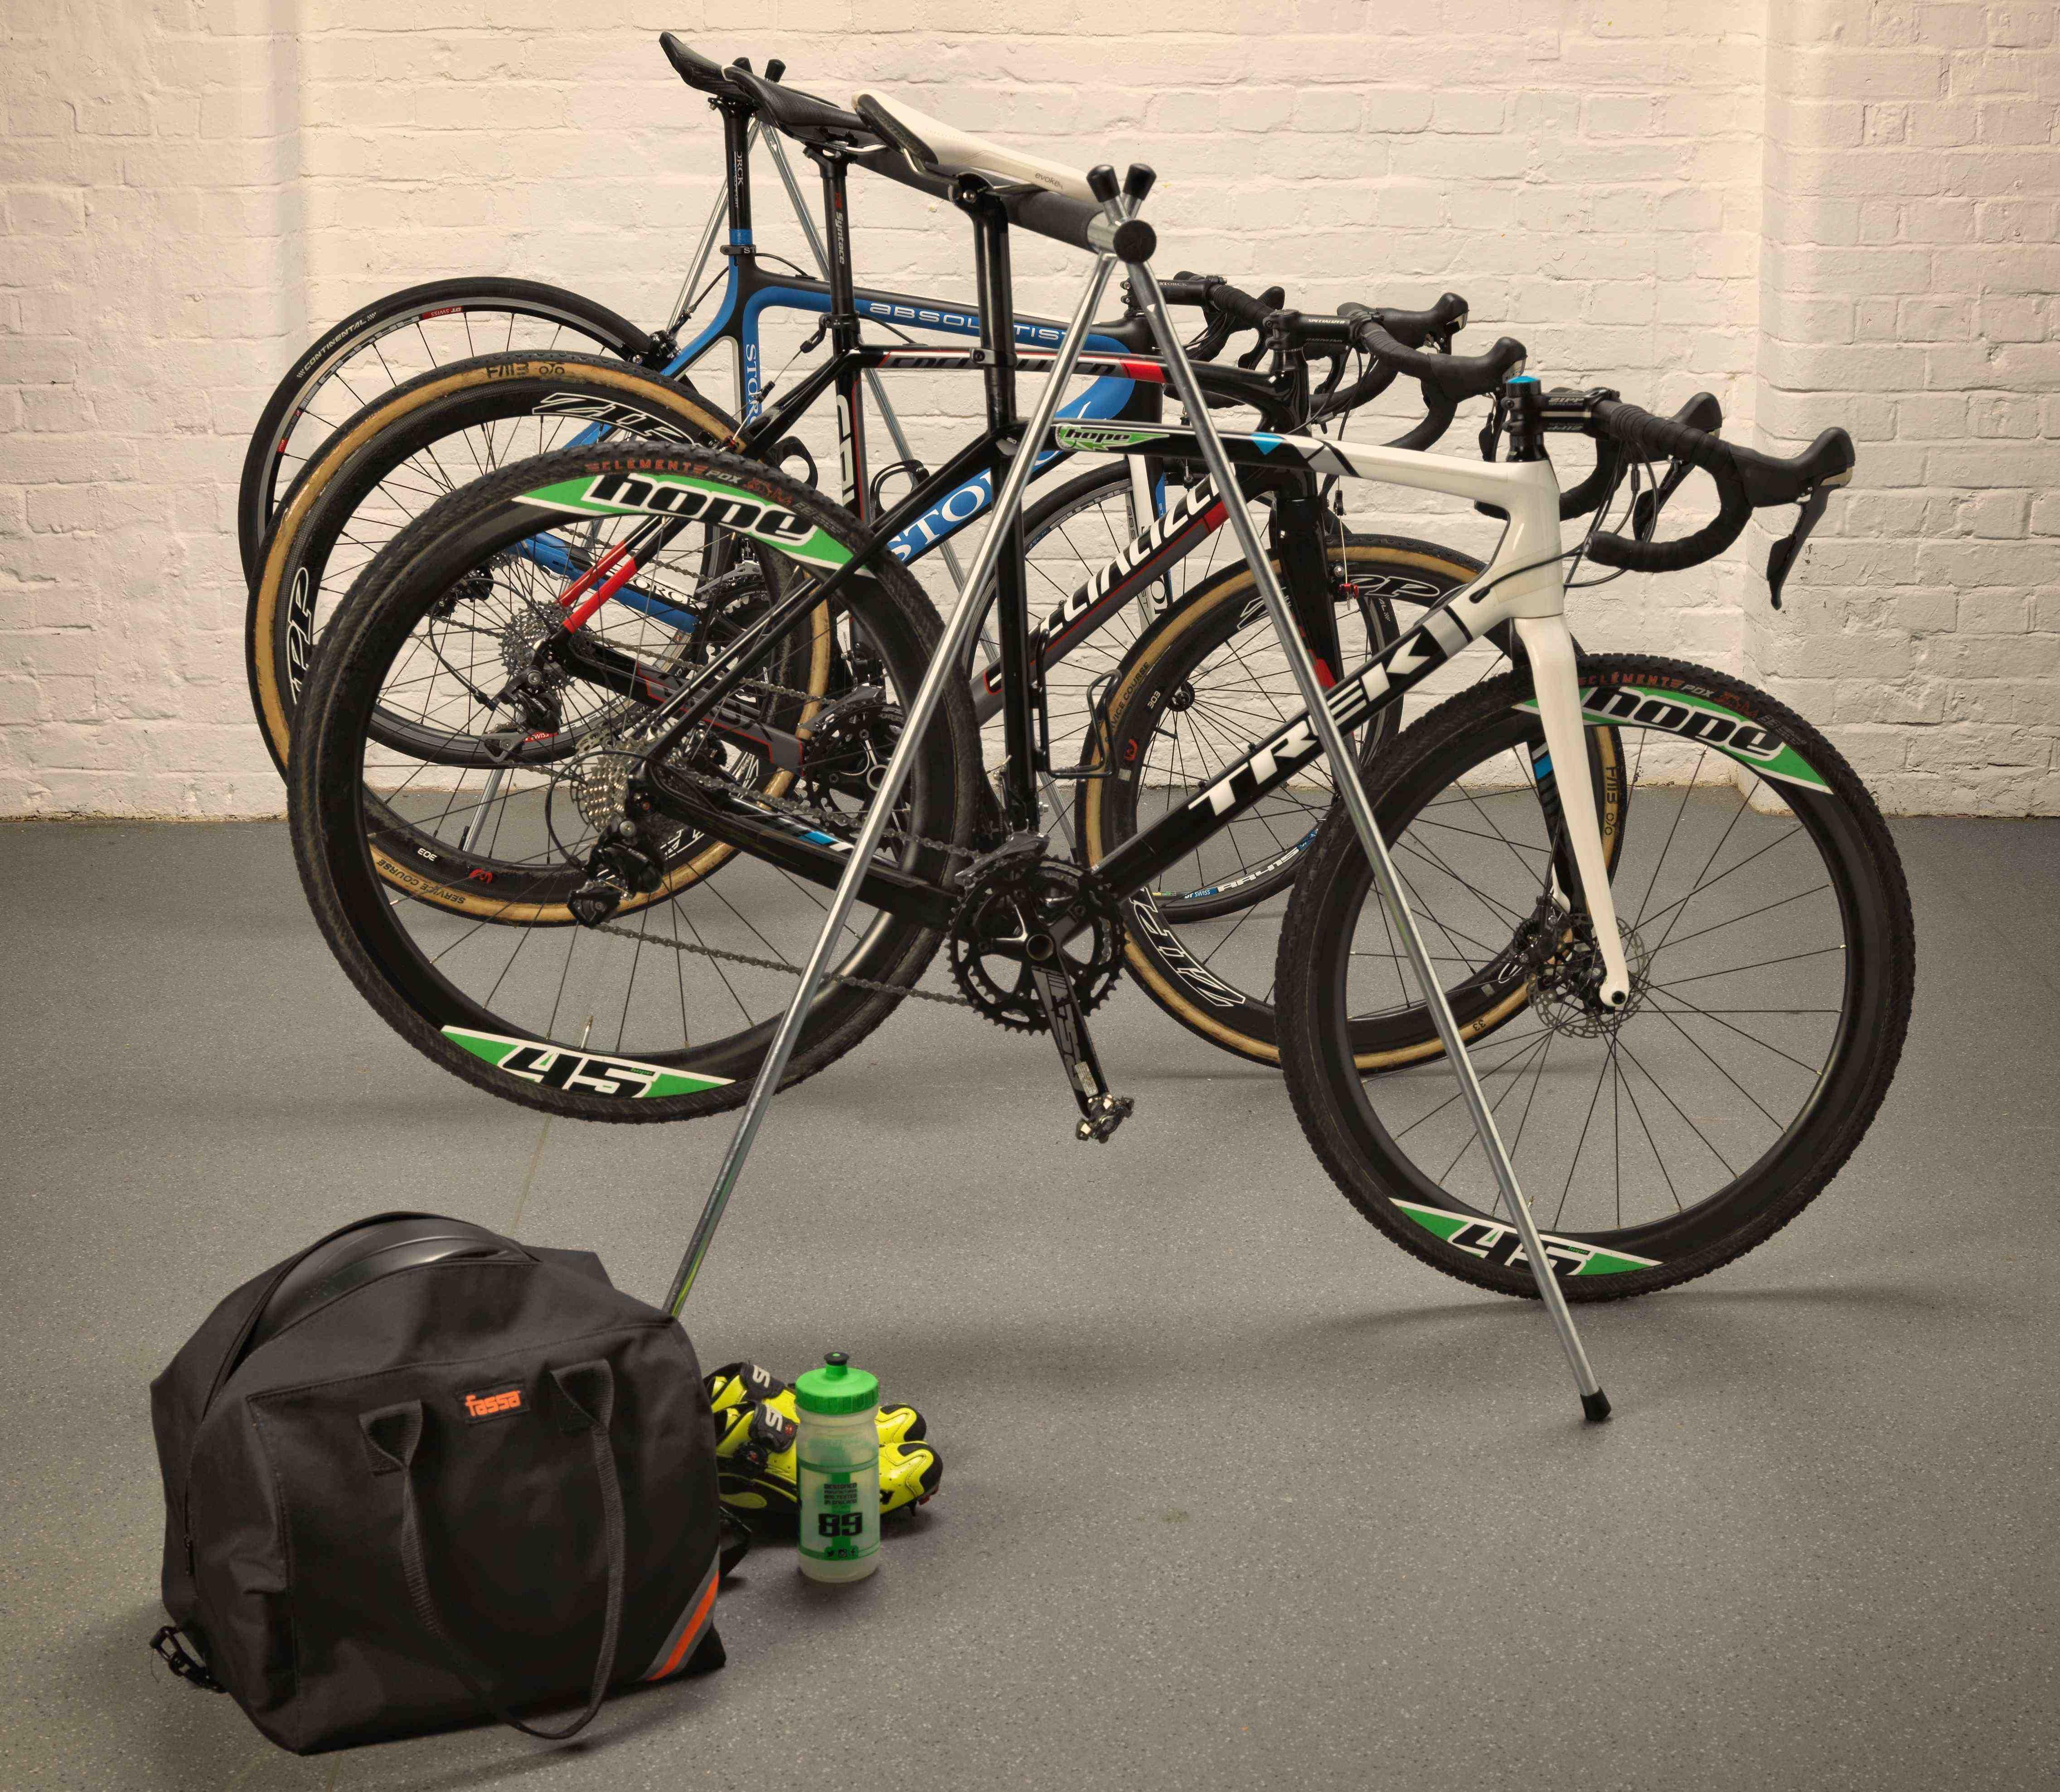 Bicycle Stand Bicycle Bicycle Stand Bike Stand